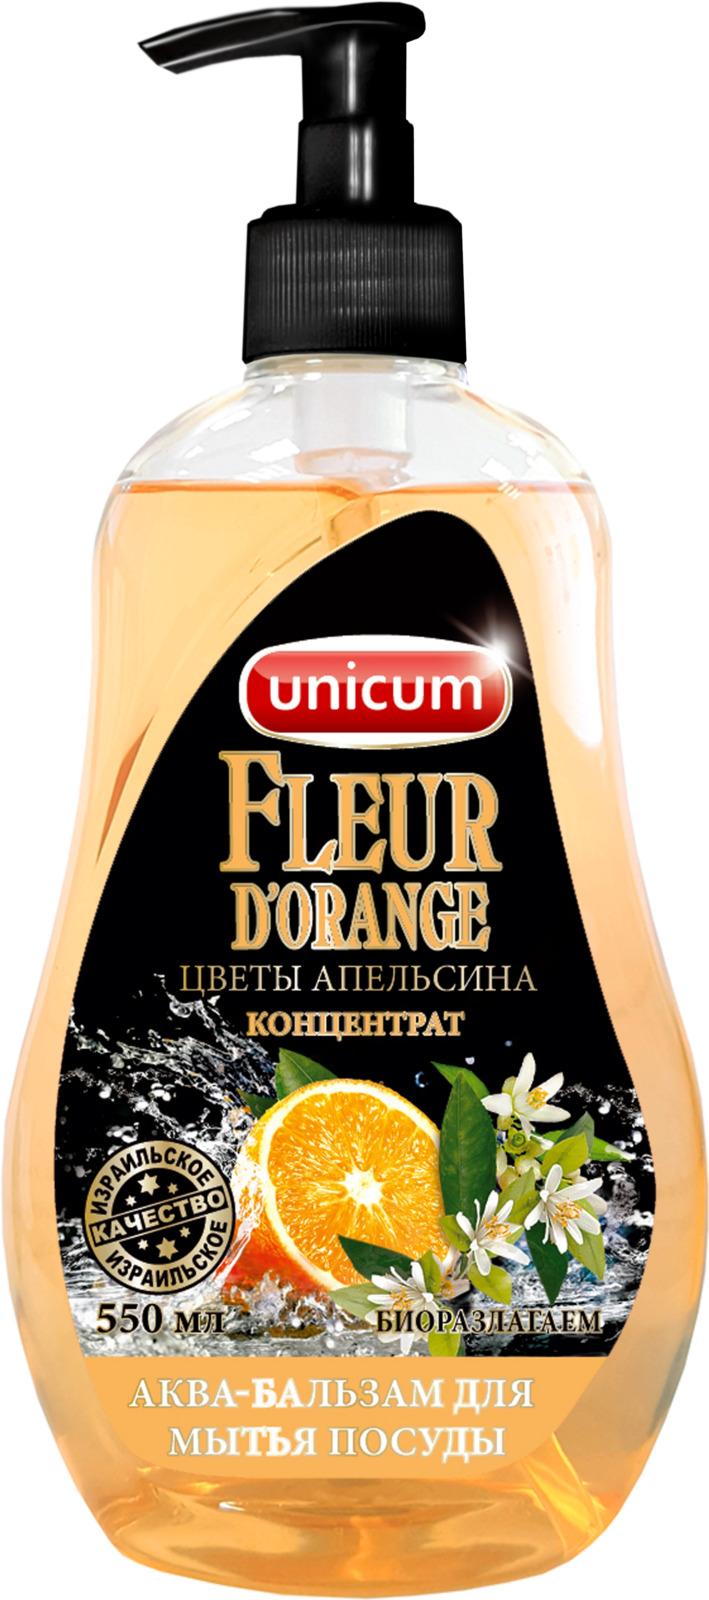 Средство для мытья посуды Unicum Цветы апельсина, 550 мл бытовая химия unicum средство для мытья посуды бережная энергия 550 мл